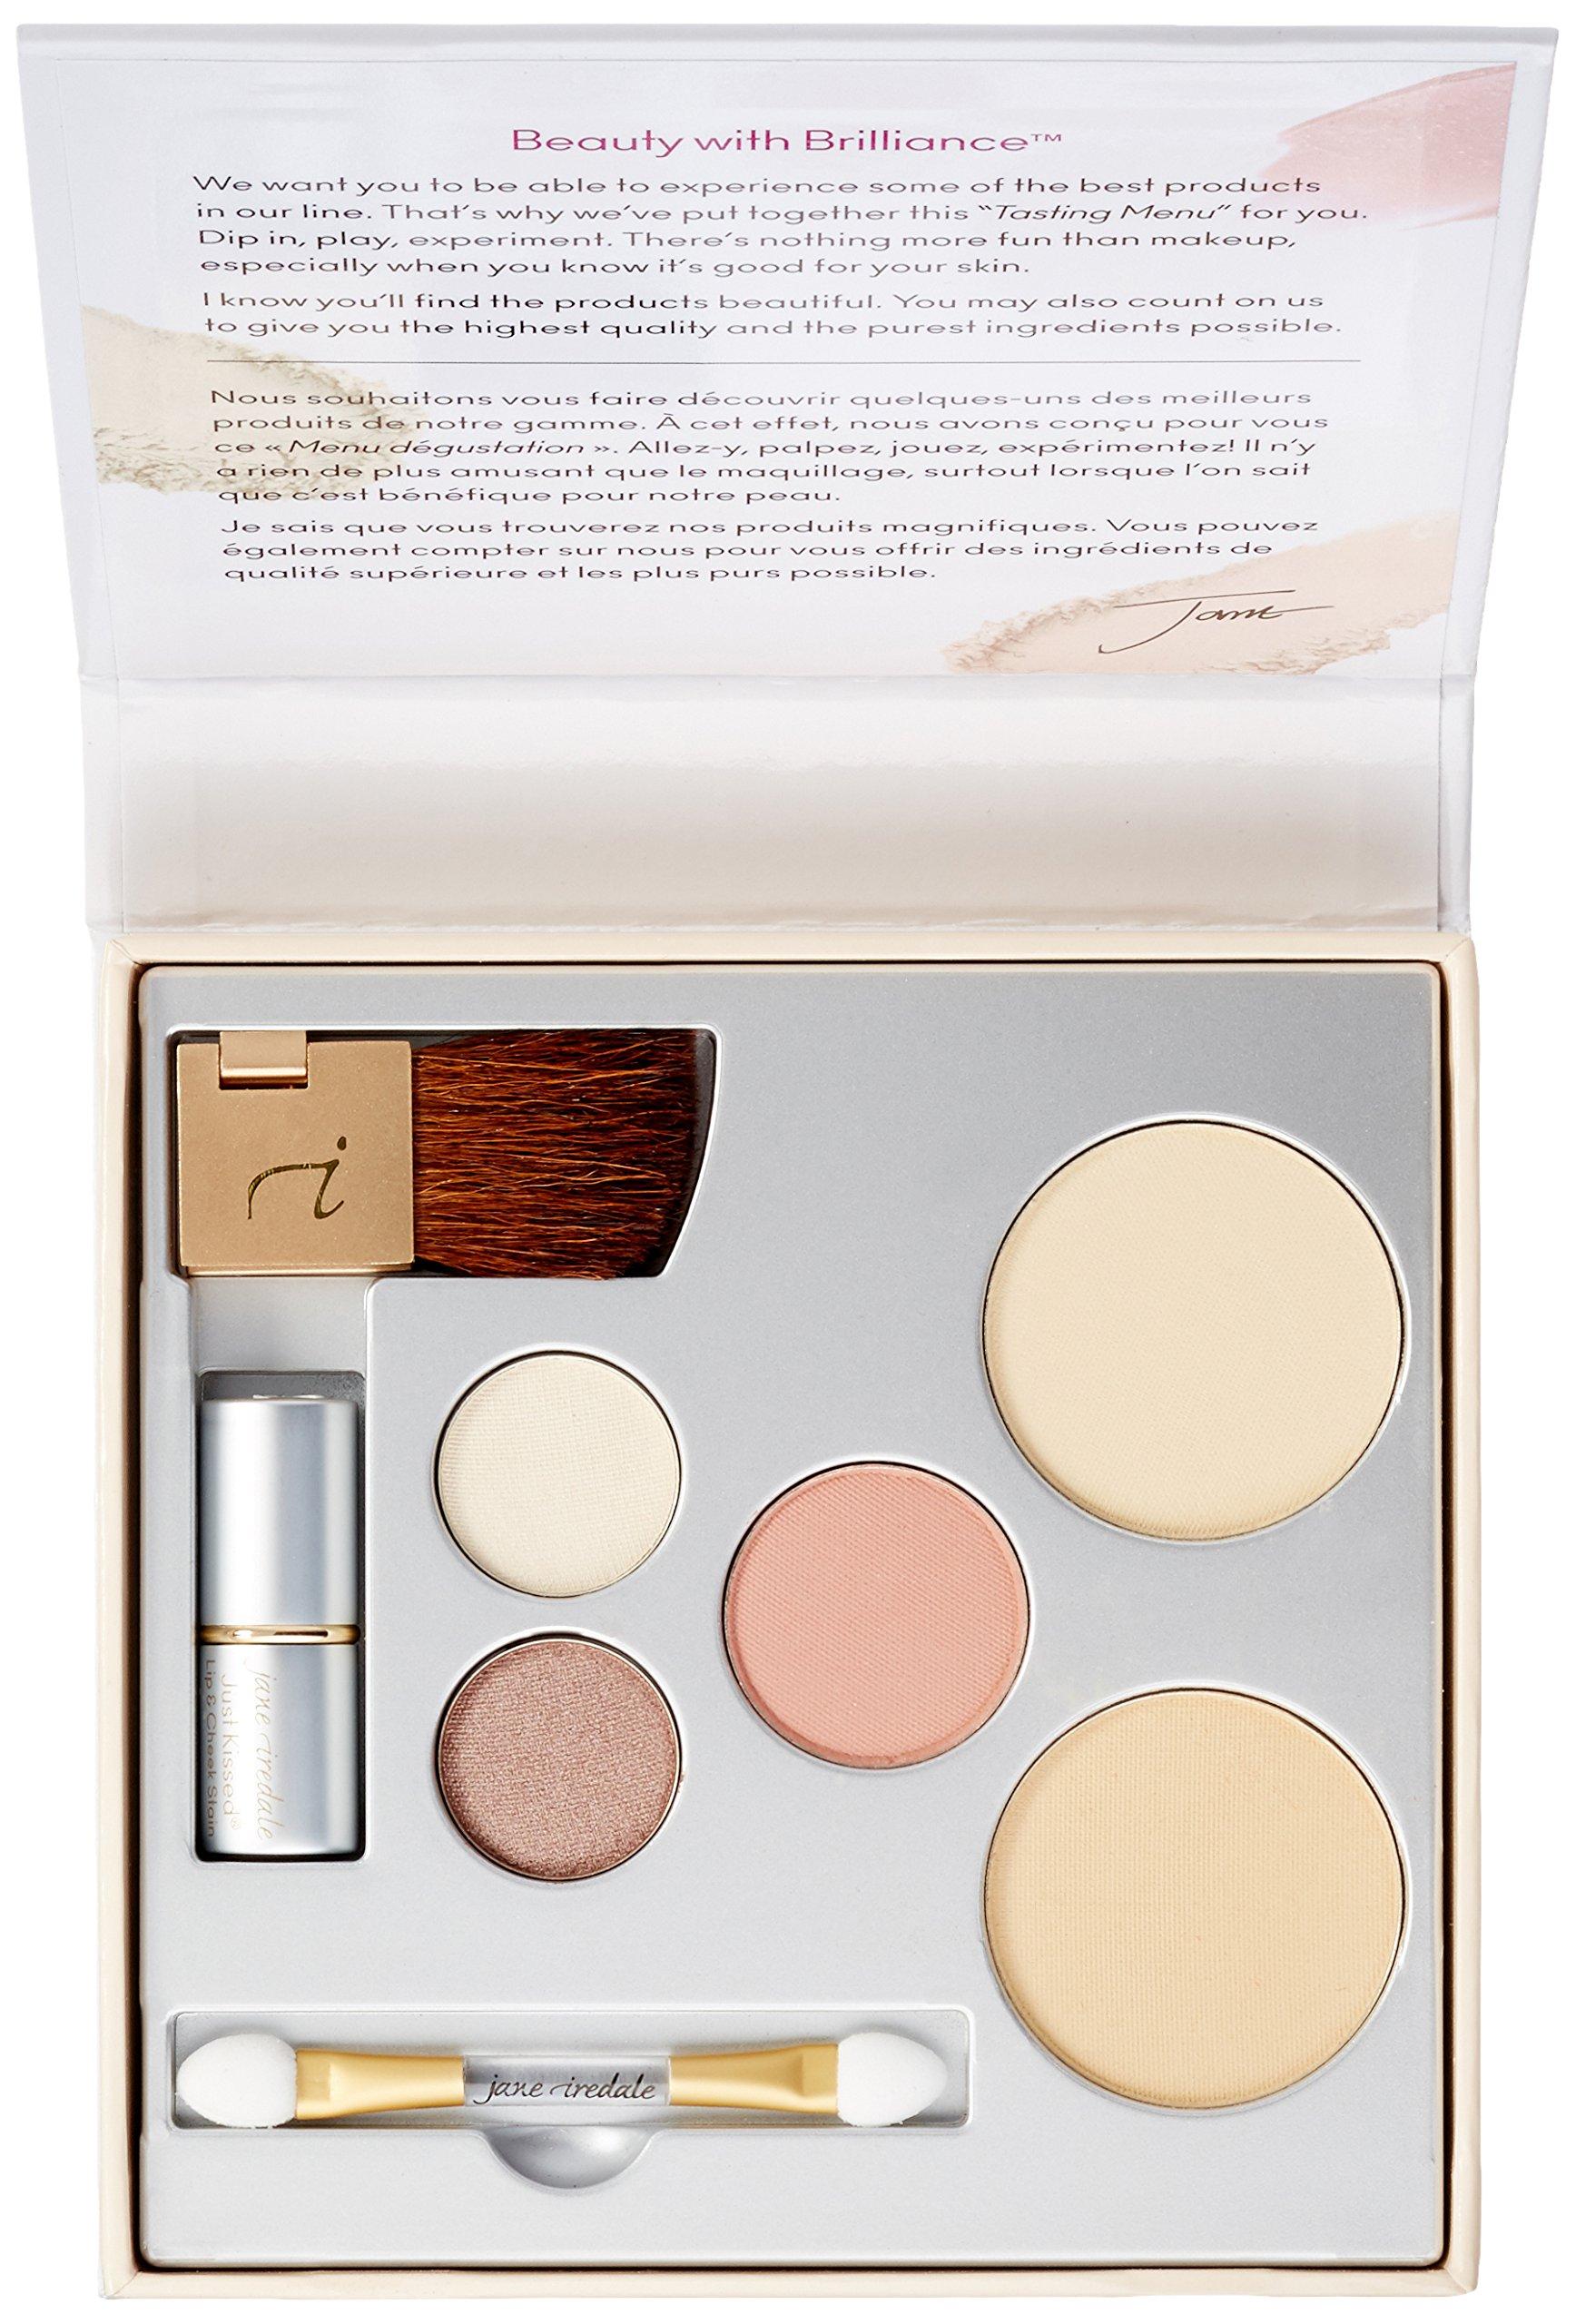 jane iredale Pure & Simple Makeup Kit, Medium.40 oz. by jane iredale (Image #6)